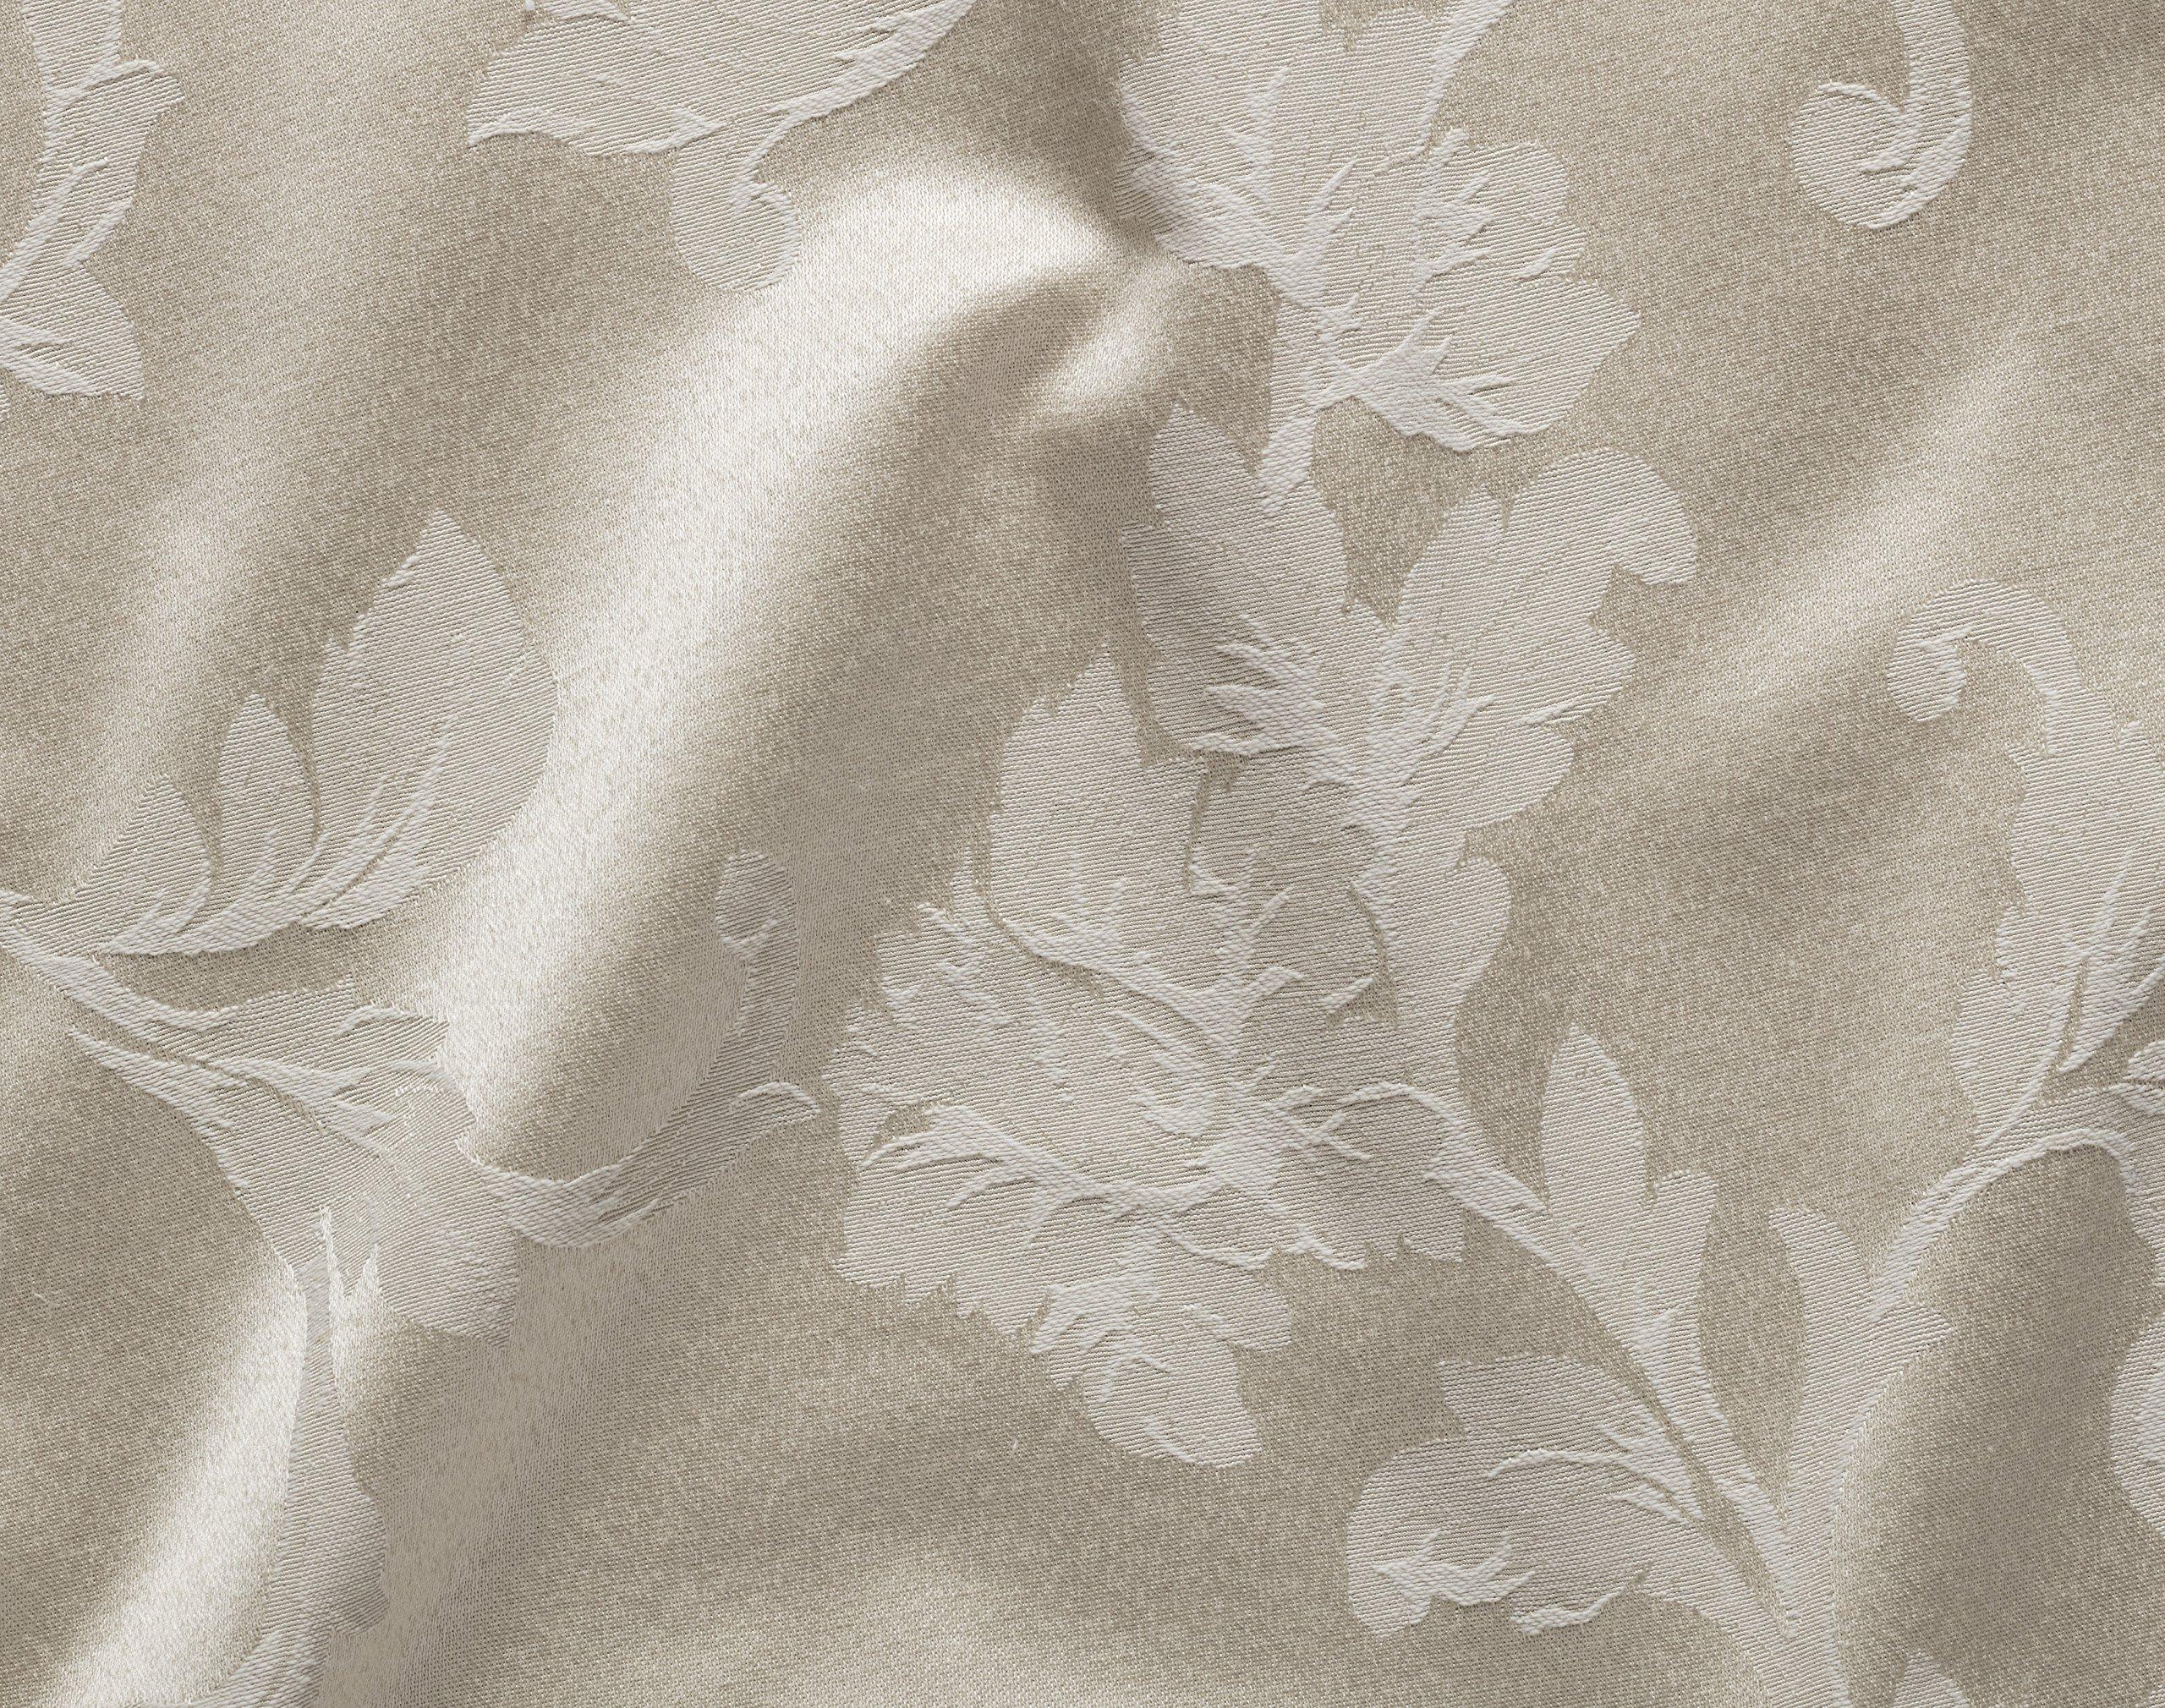 Benson Mills Harmony Scroll Set of 4 Napkins (Birch, 18'' x 18'' Napkin) by Benson Mills (Image #2)